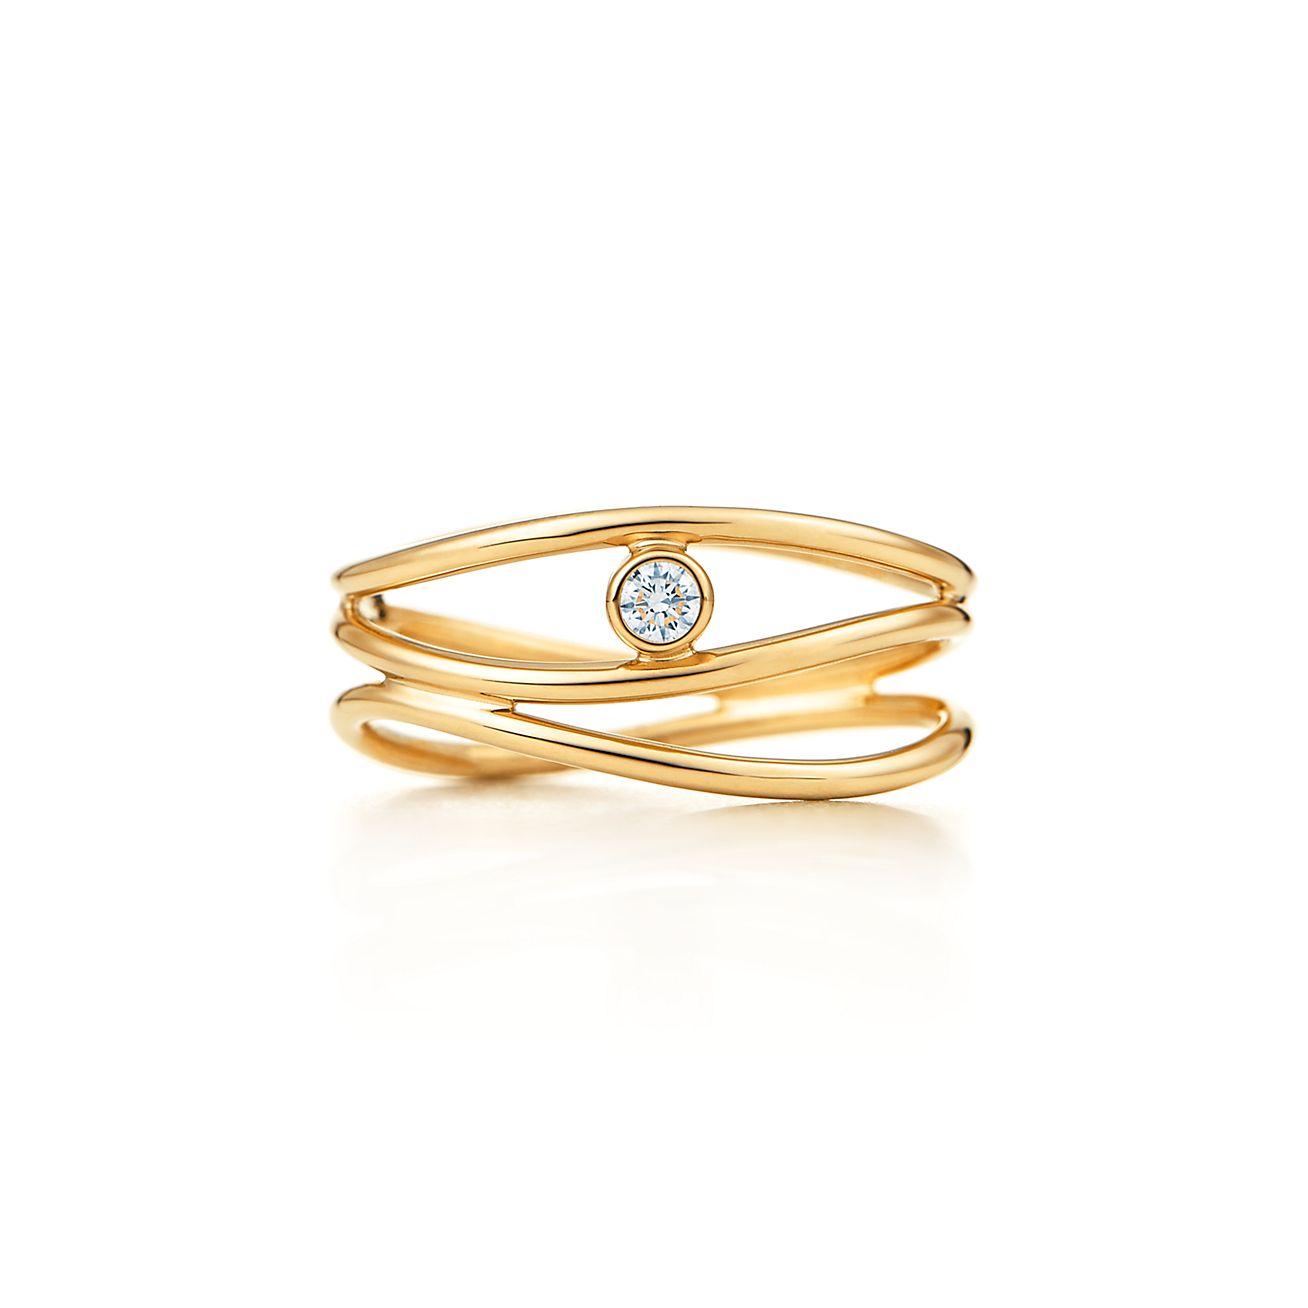 Elsa Peretti Wave single-row diamond ring in 18k gold - Size 5 1/2 Tiffany & Co.